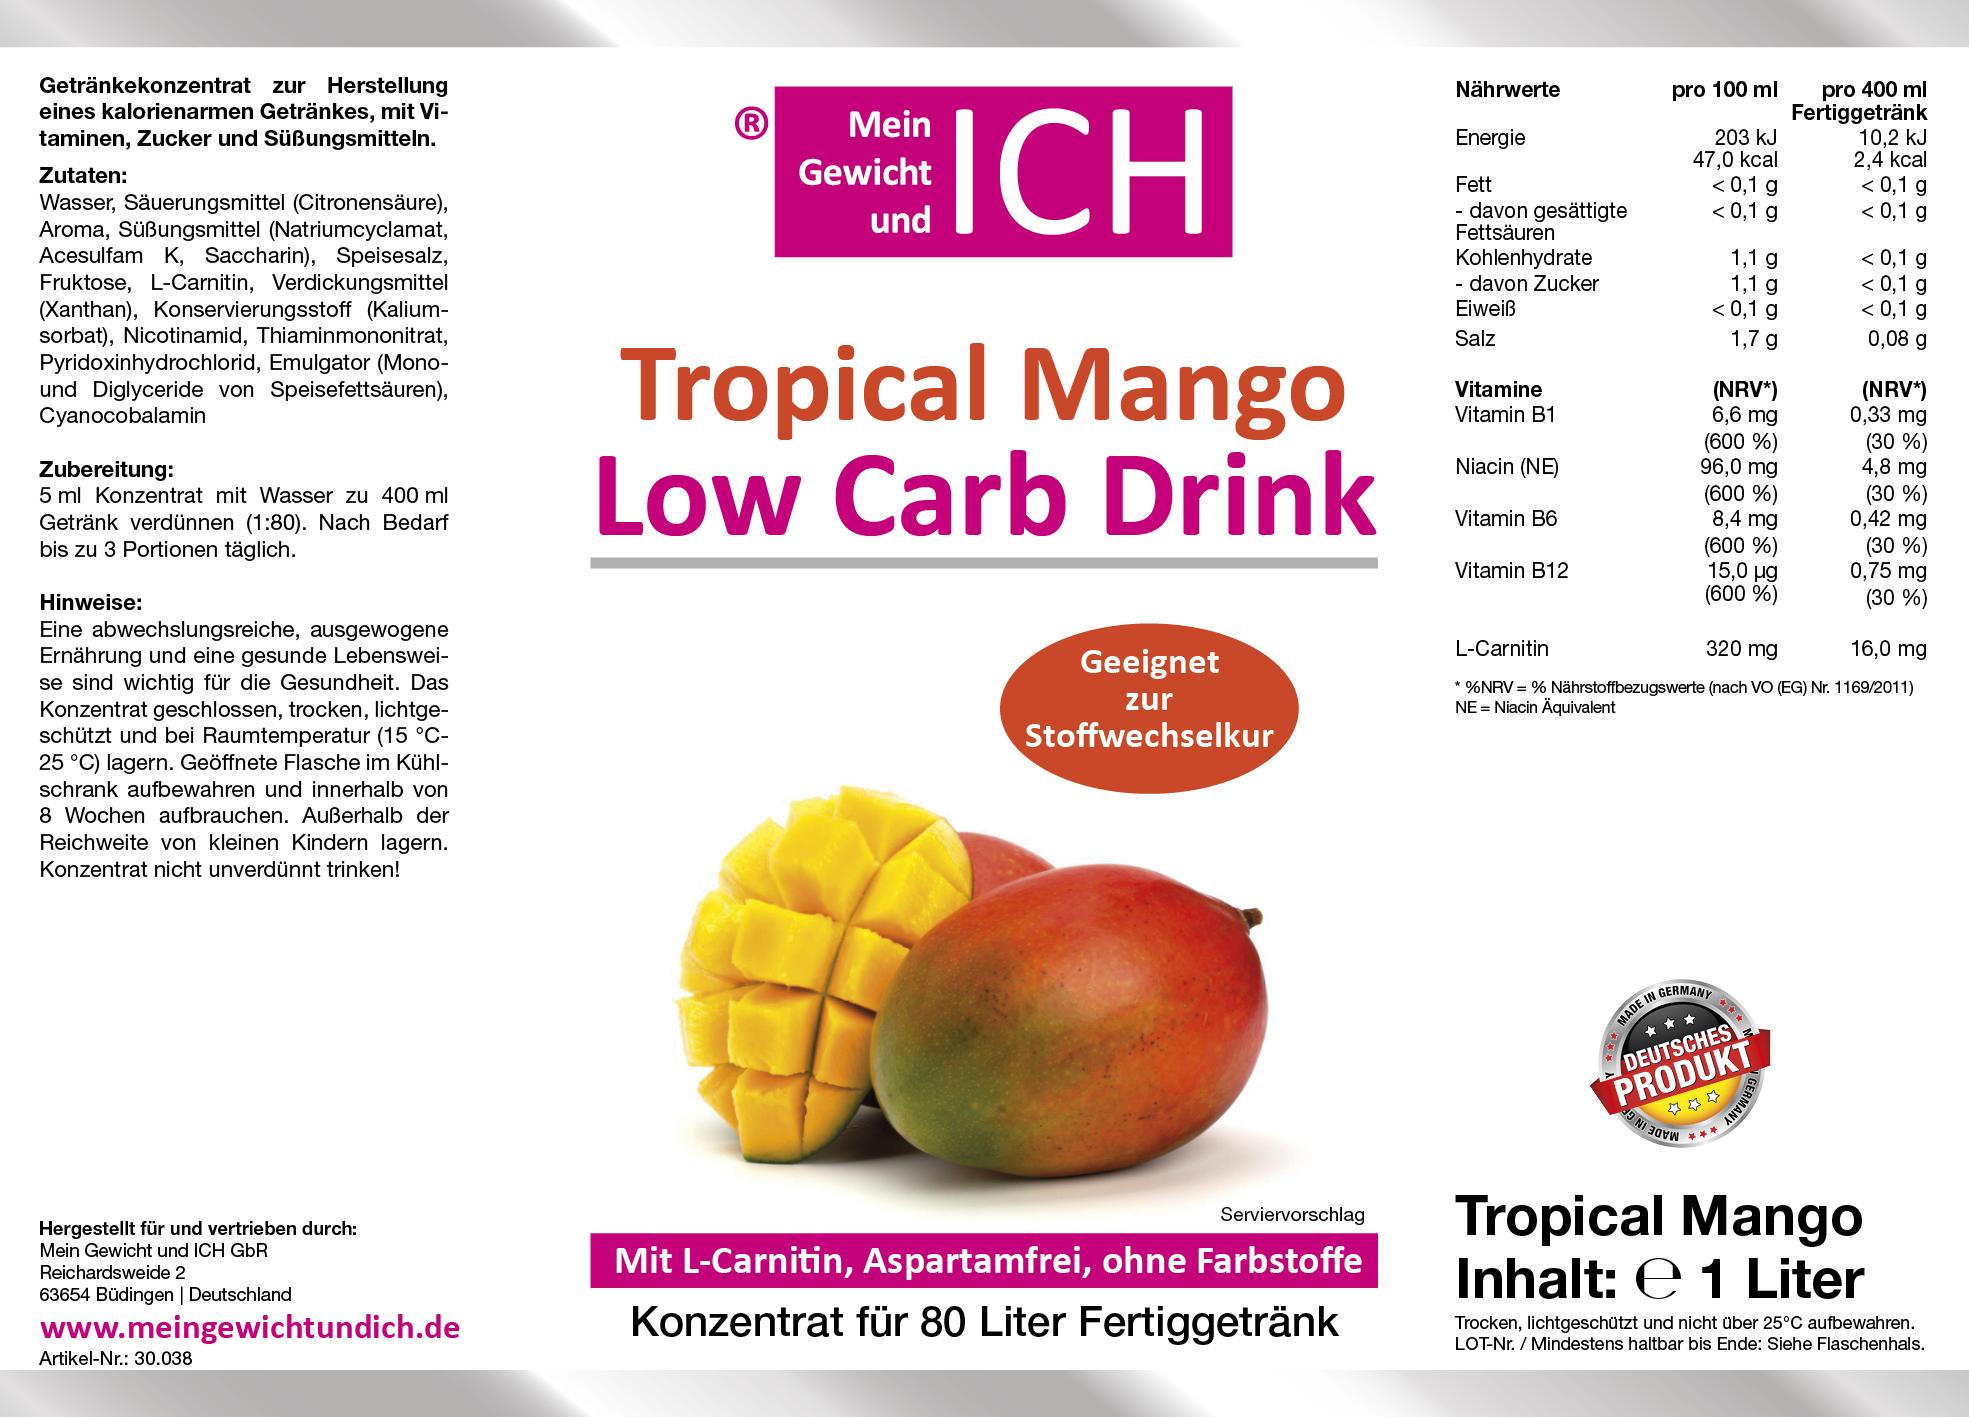 Jetzt 4 neue farbstoff-freie kalorienarme Mineraldrinks | Schuck Fitness